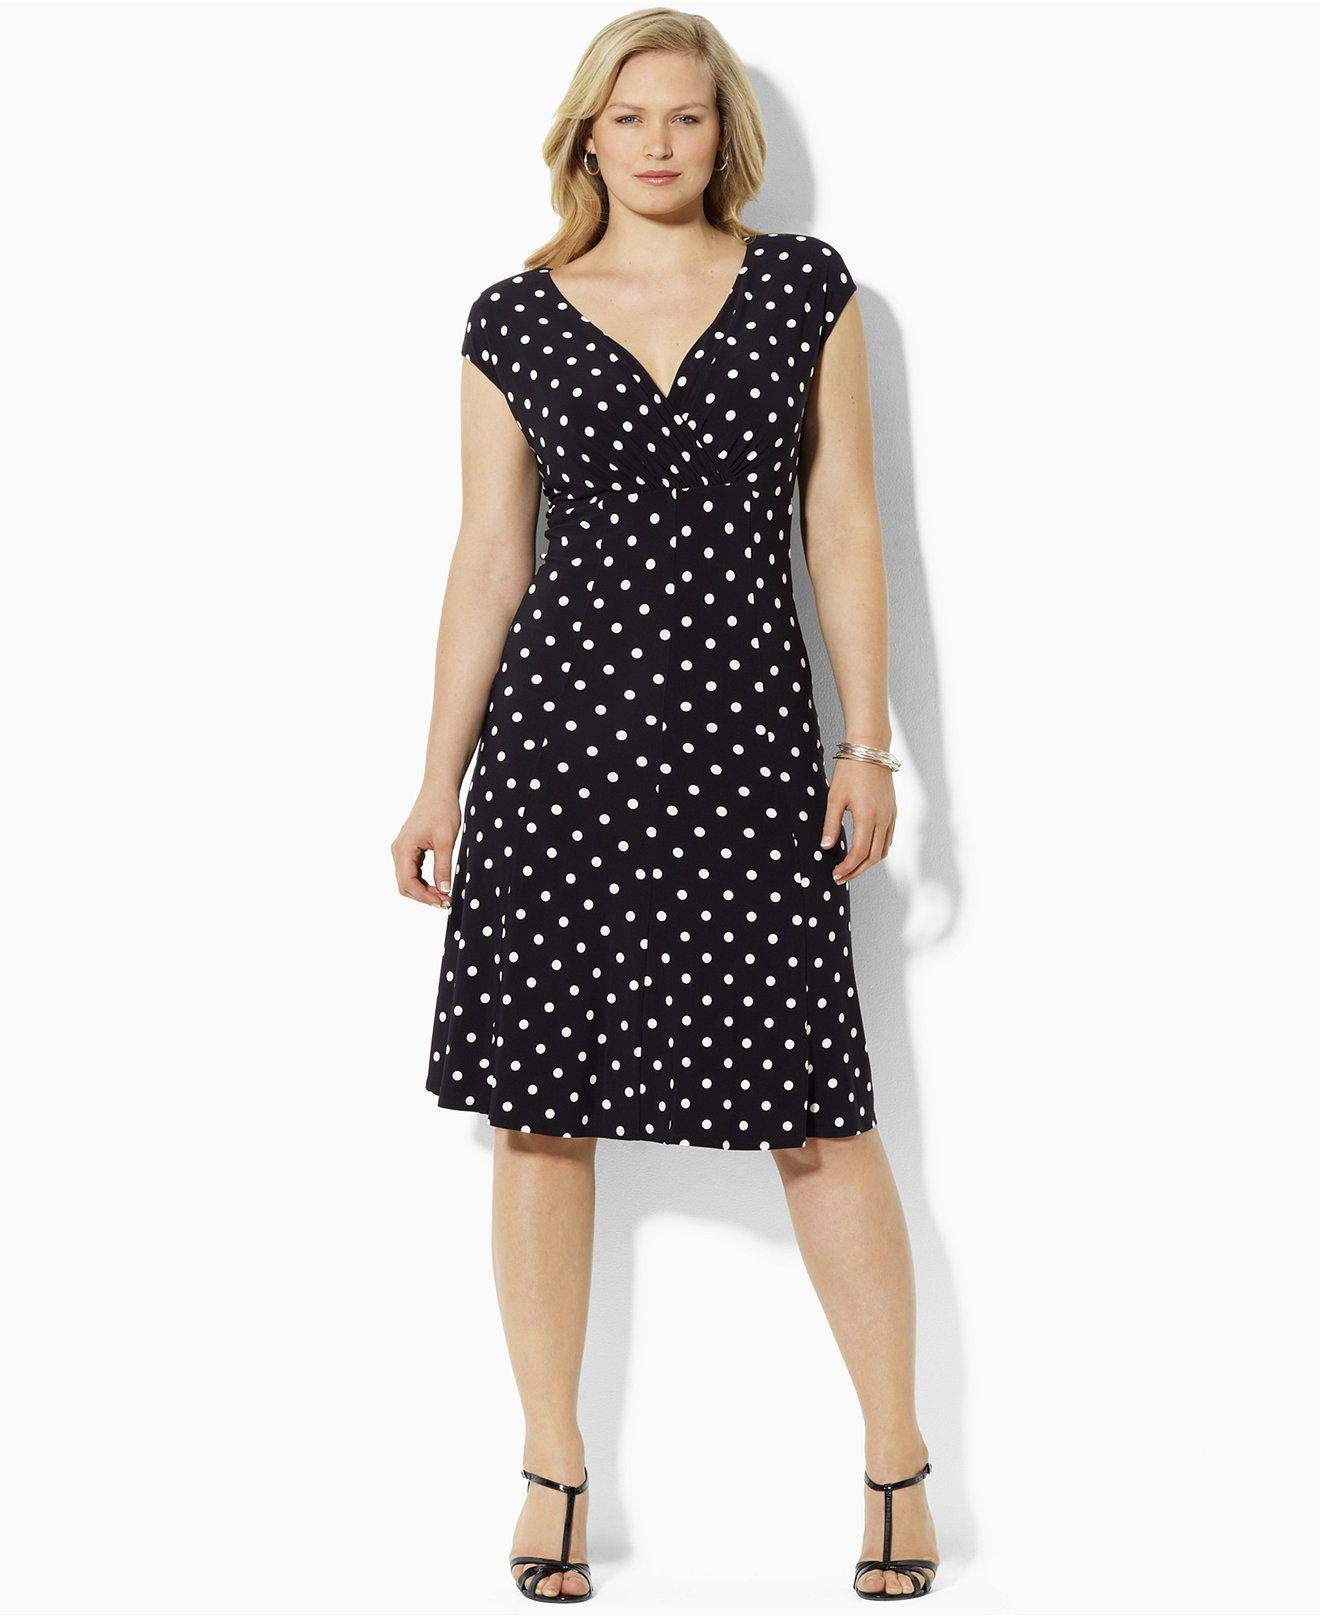 Lauren Ralph Lauren Plus Size Polka Dot Cap Sleeve Dress Dresses